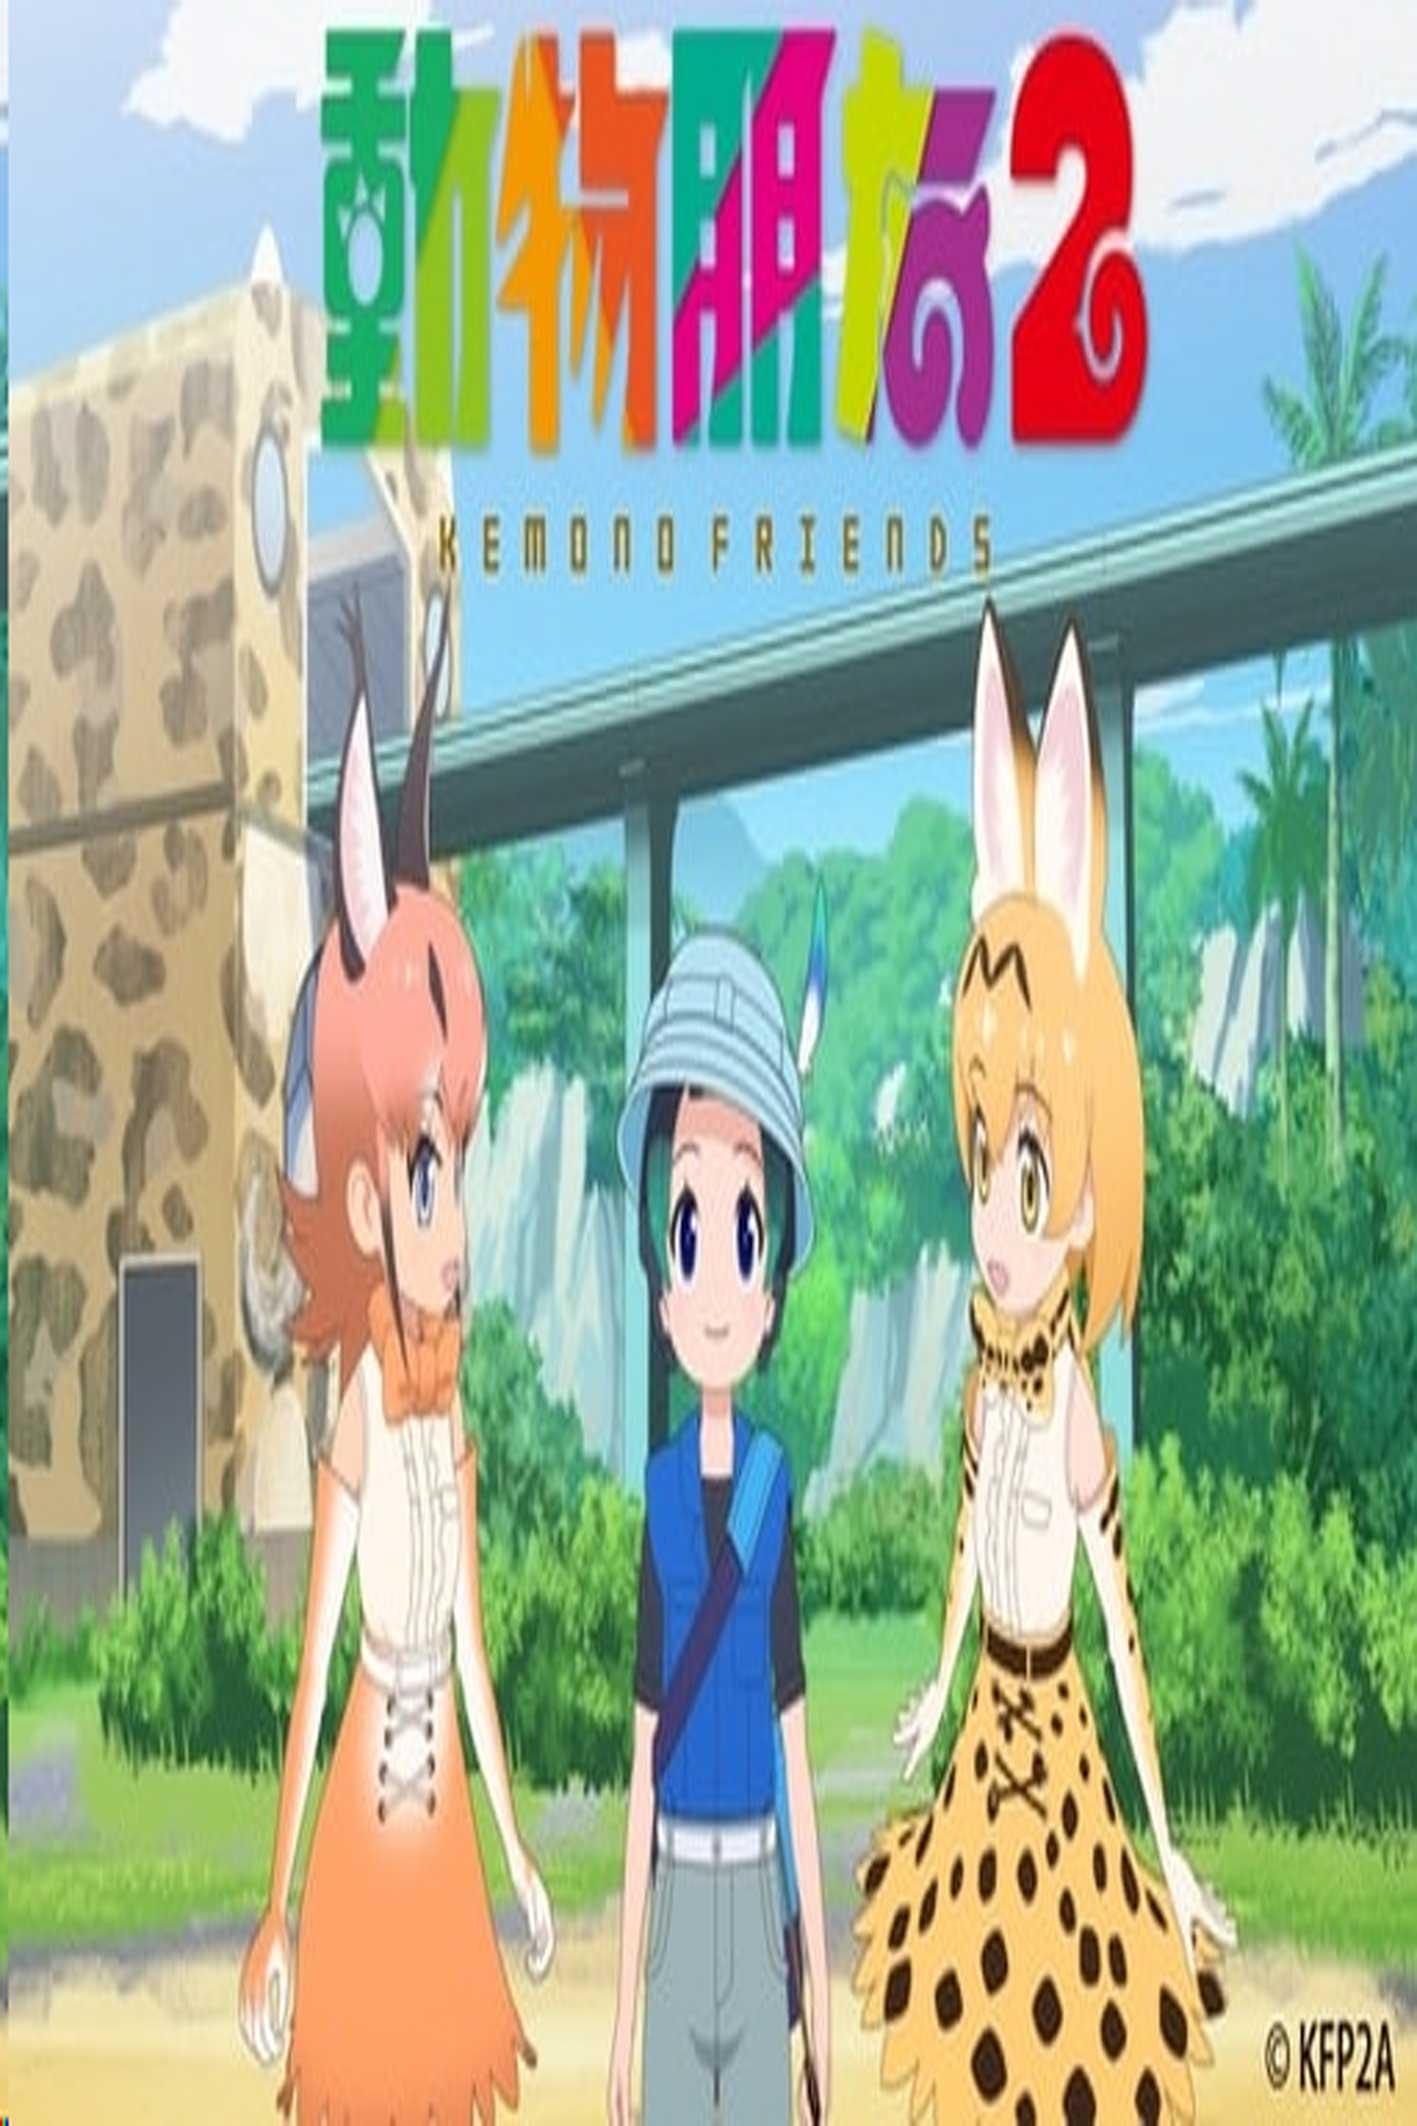 Kemono Friends S2 - 動物朋友2